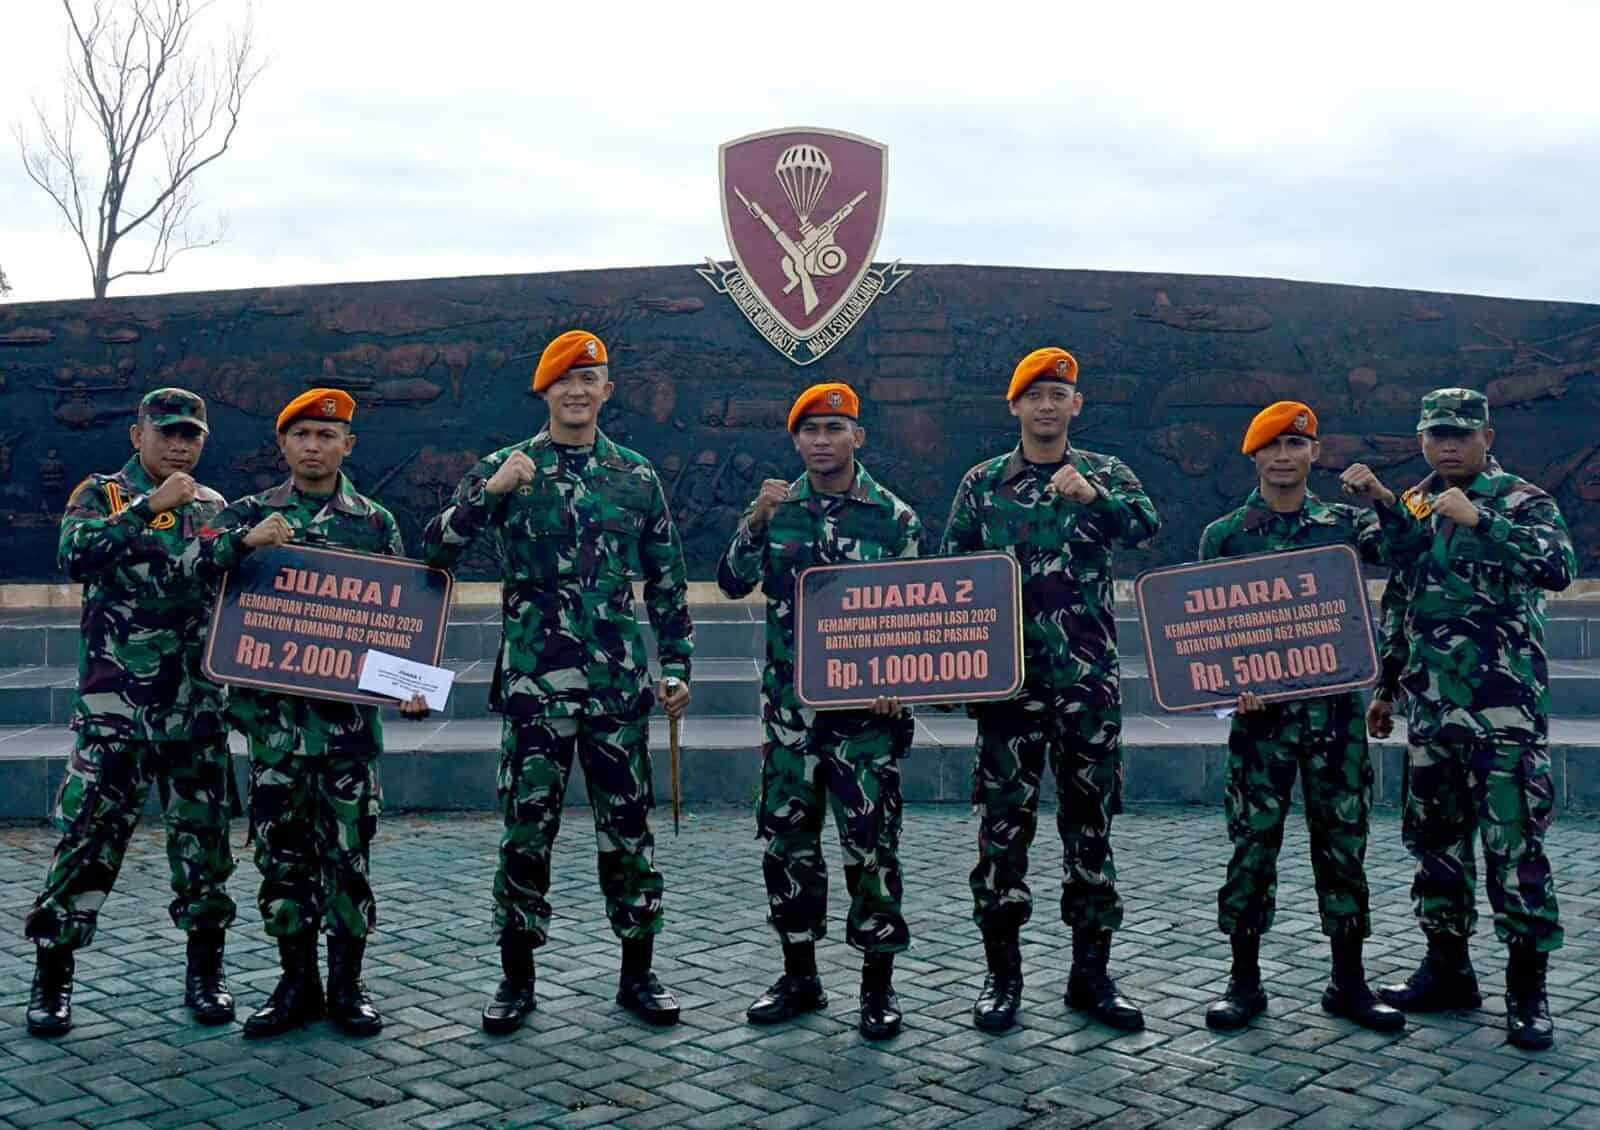 Danyonko 462 Paskhas Memberikan Pengharga Kepada Peraih Nilai Tertinggi Di Laso 2020